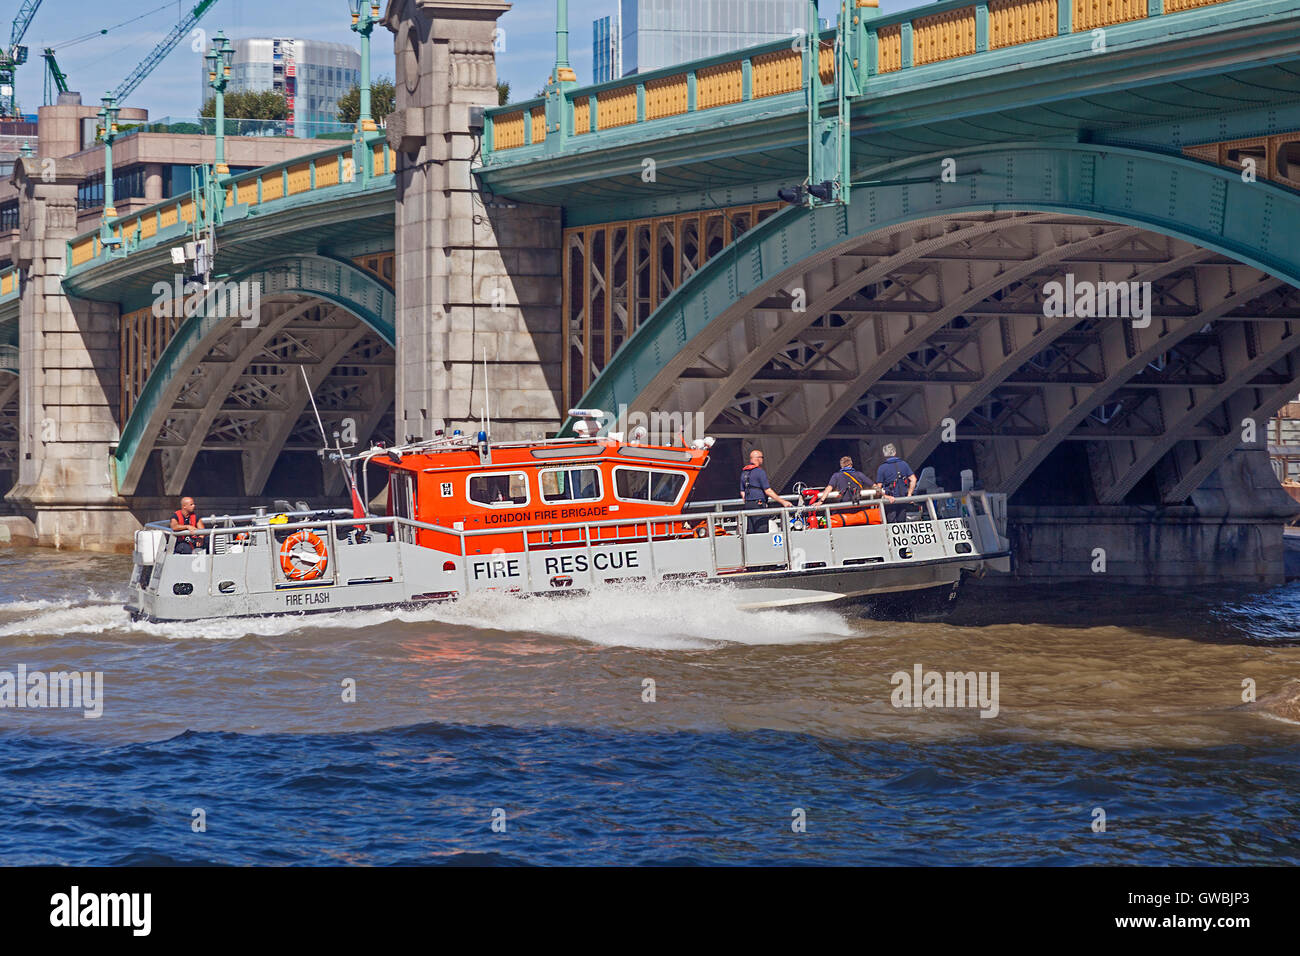 A Fire Rescue vessel of the London Fire Brigade speeding downstream under Southwark Bridge - Stock Image